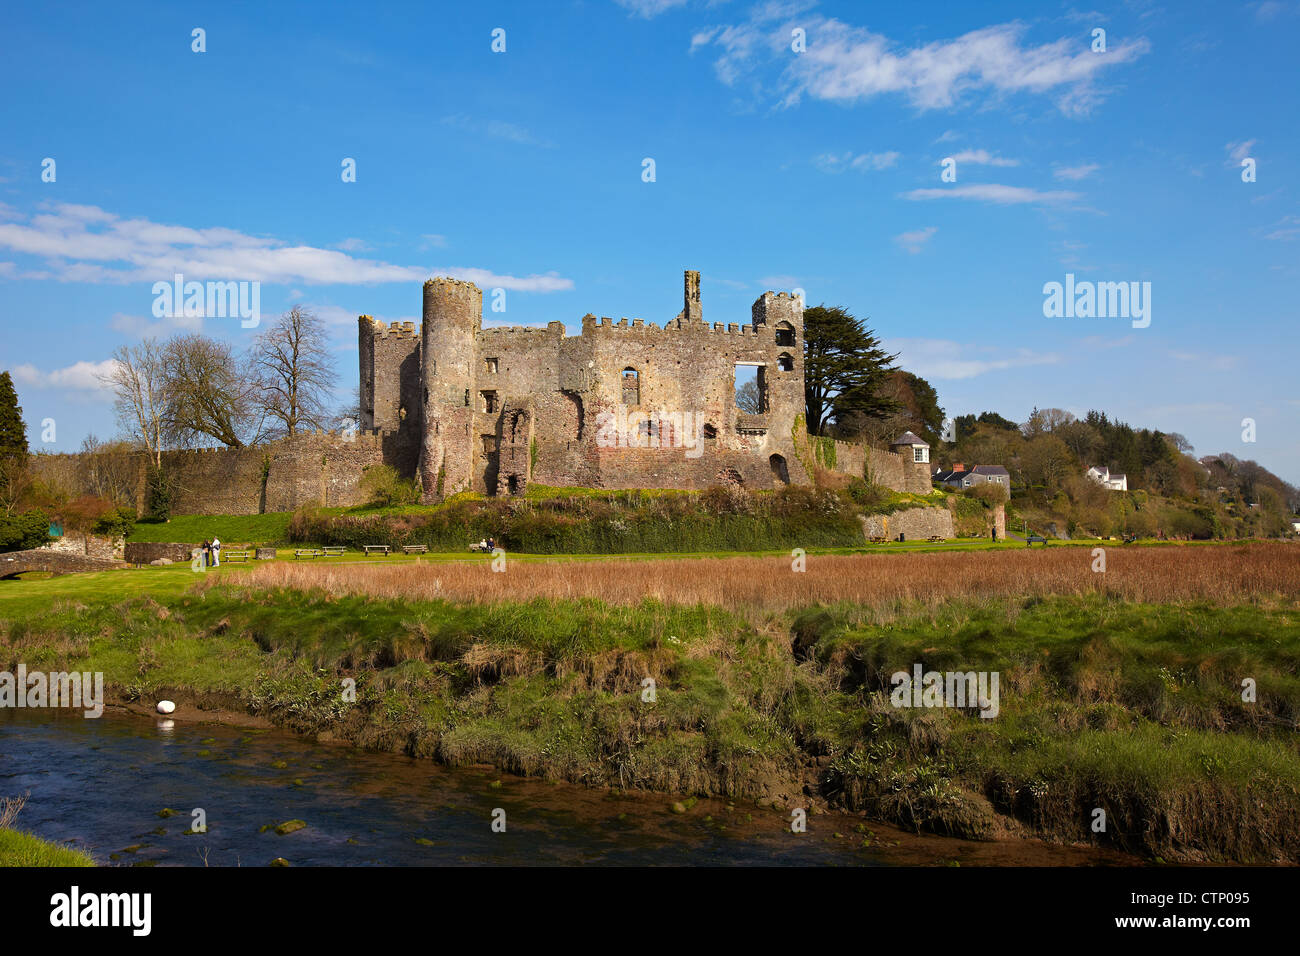 Laugharne Castle, Carmarthenshire, Wales, UK - Stock Image